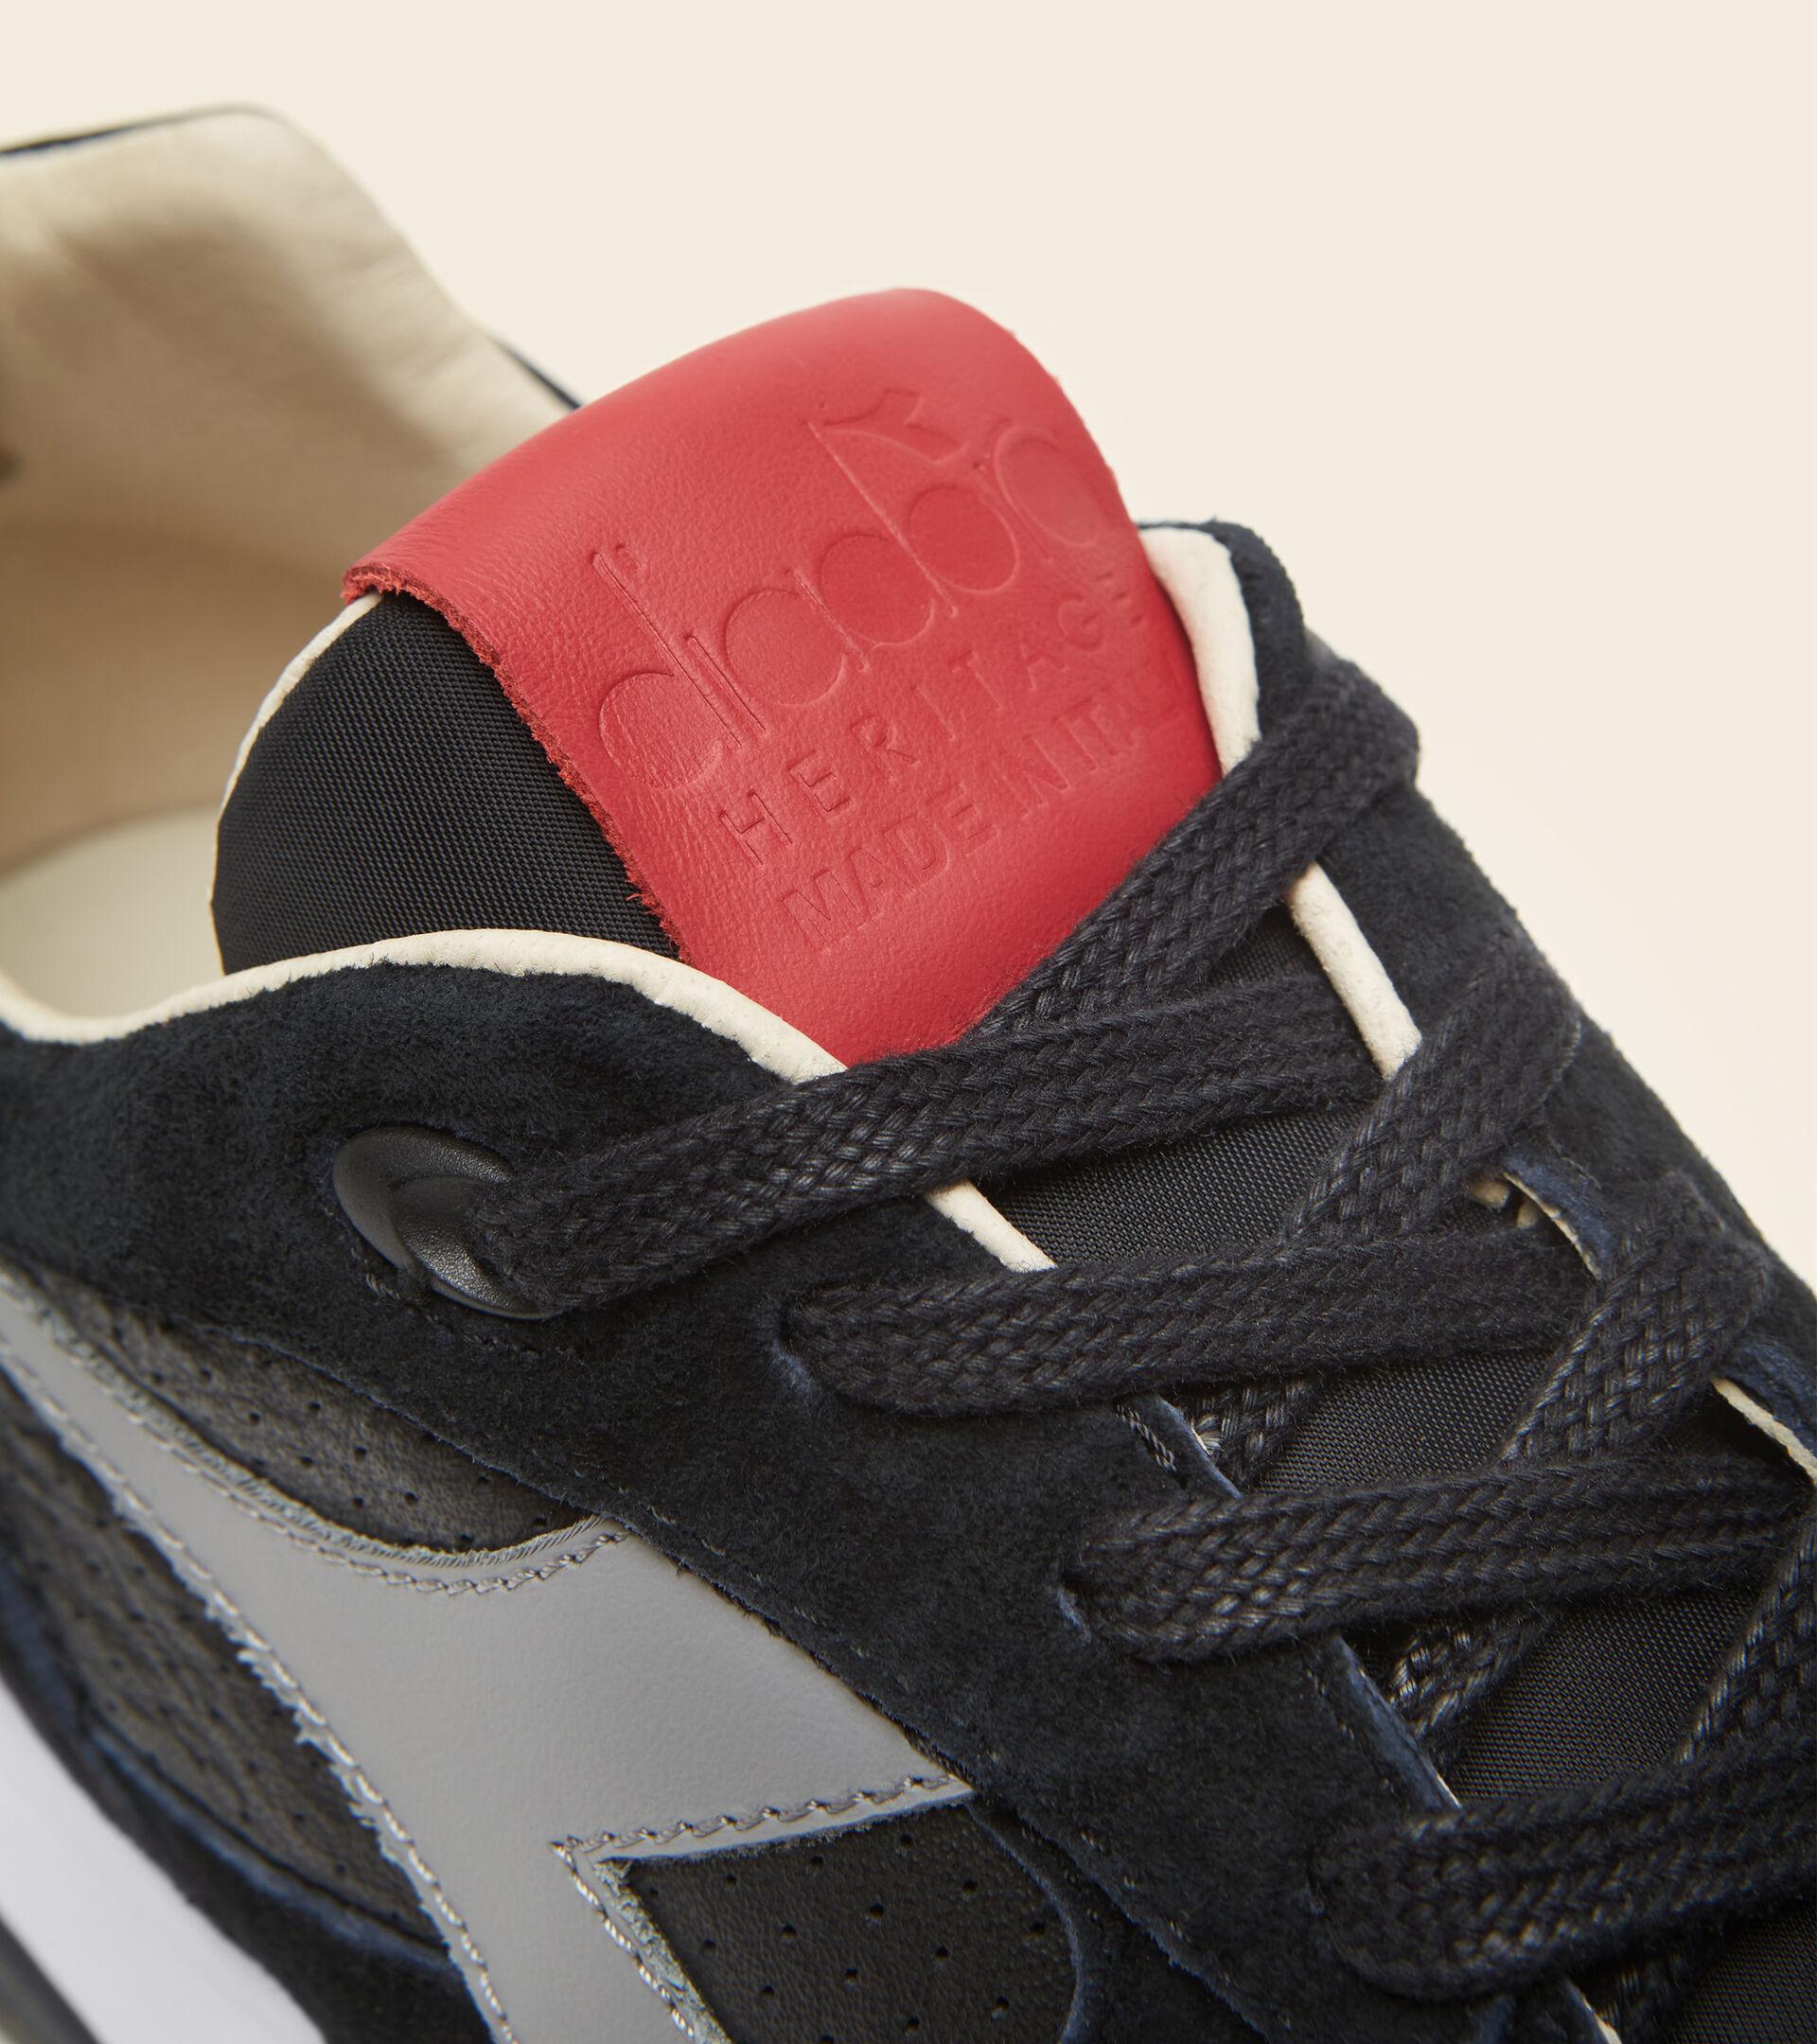 Footwear Heritage UOMO ECLIPSE ITALIA NERO Diadora